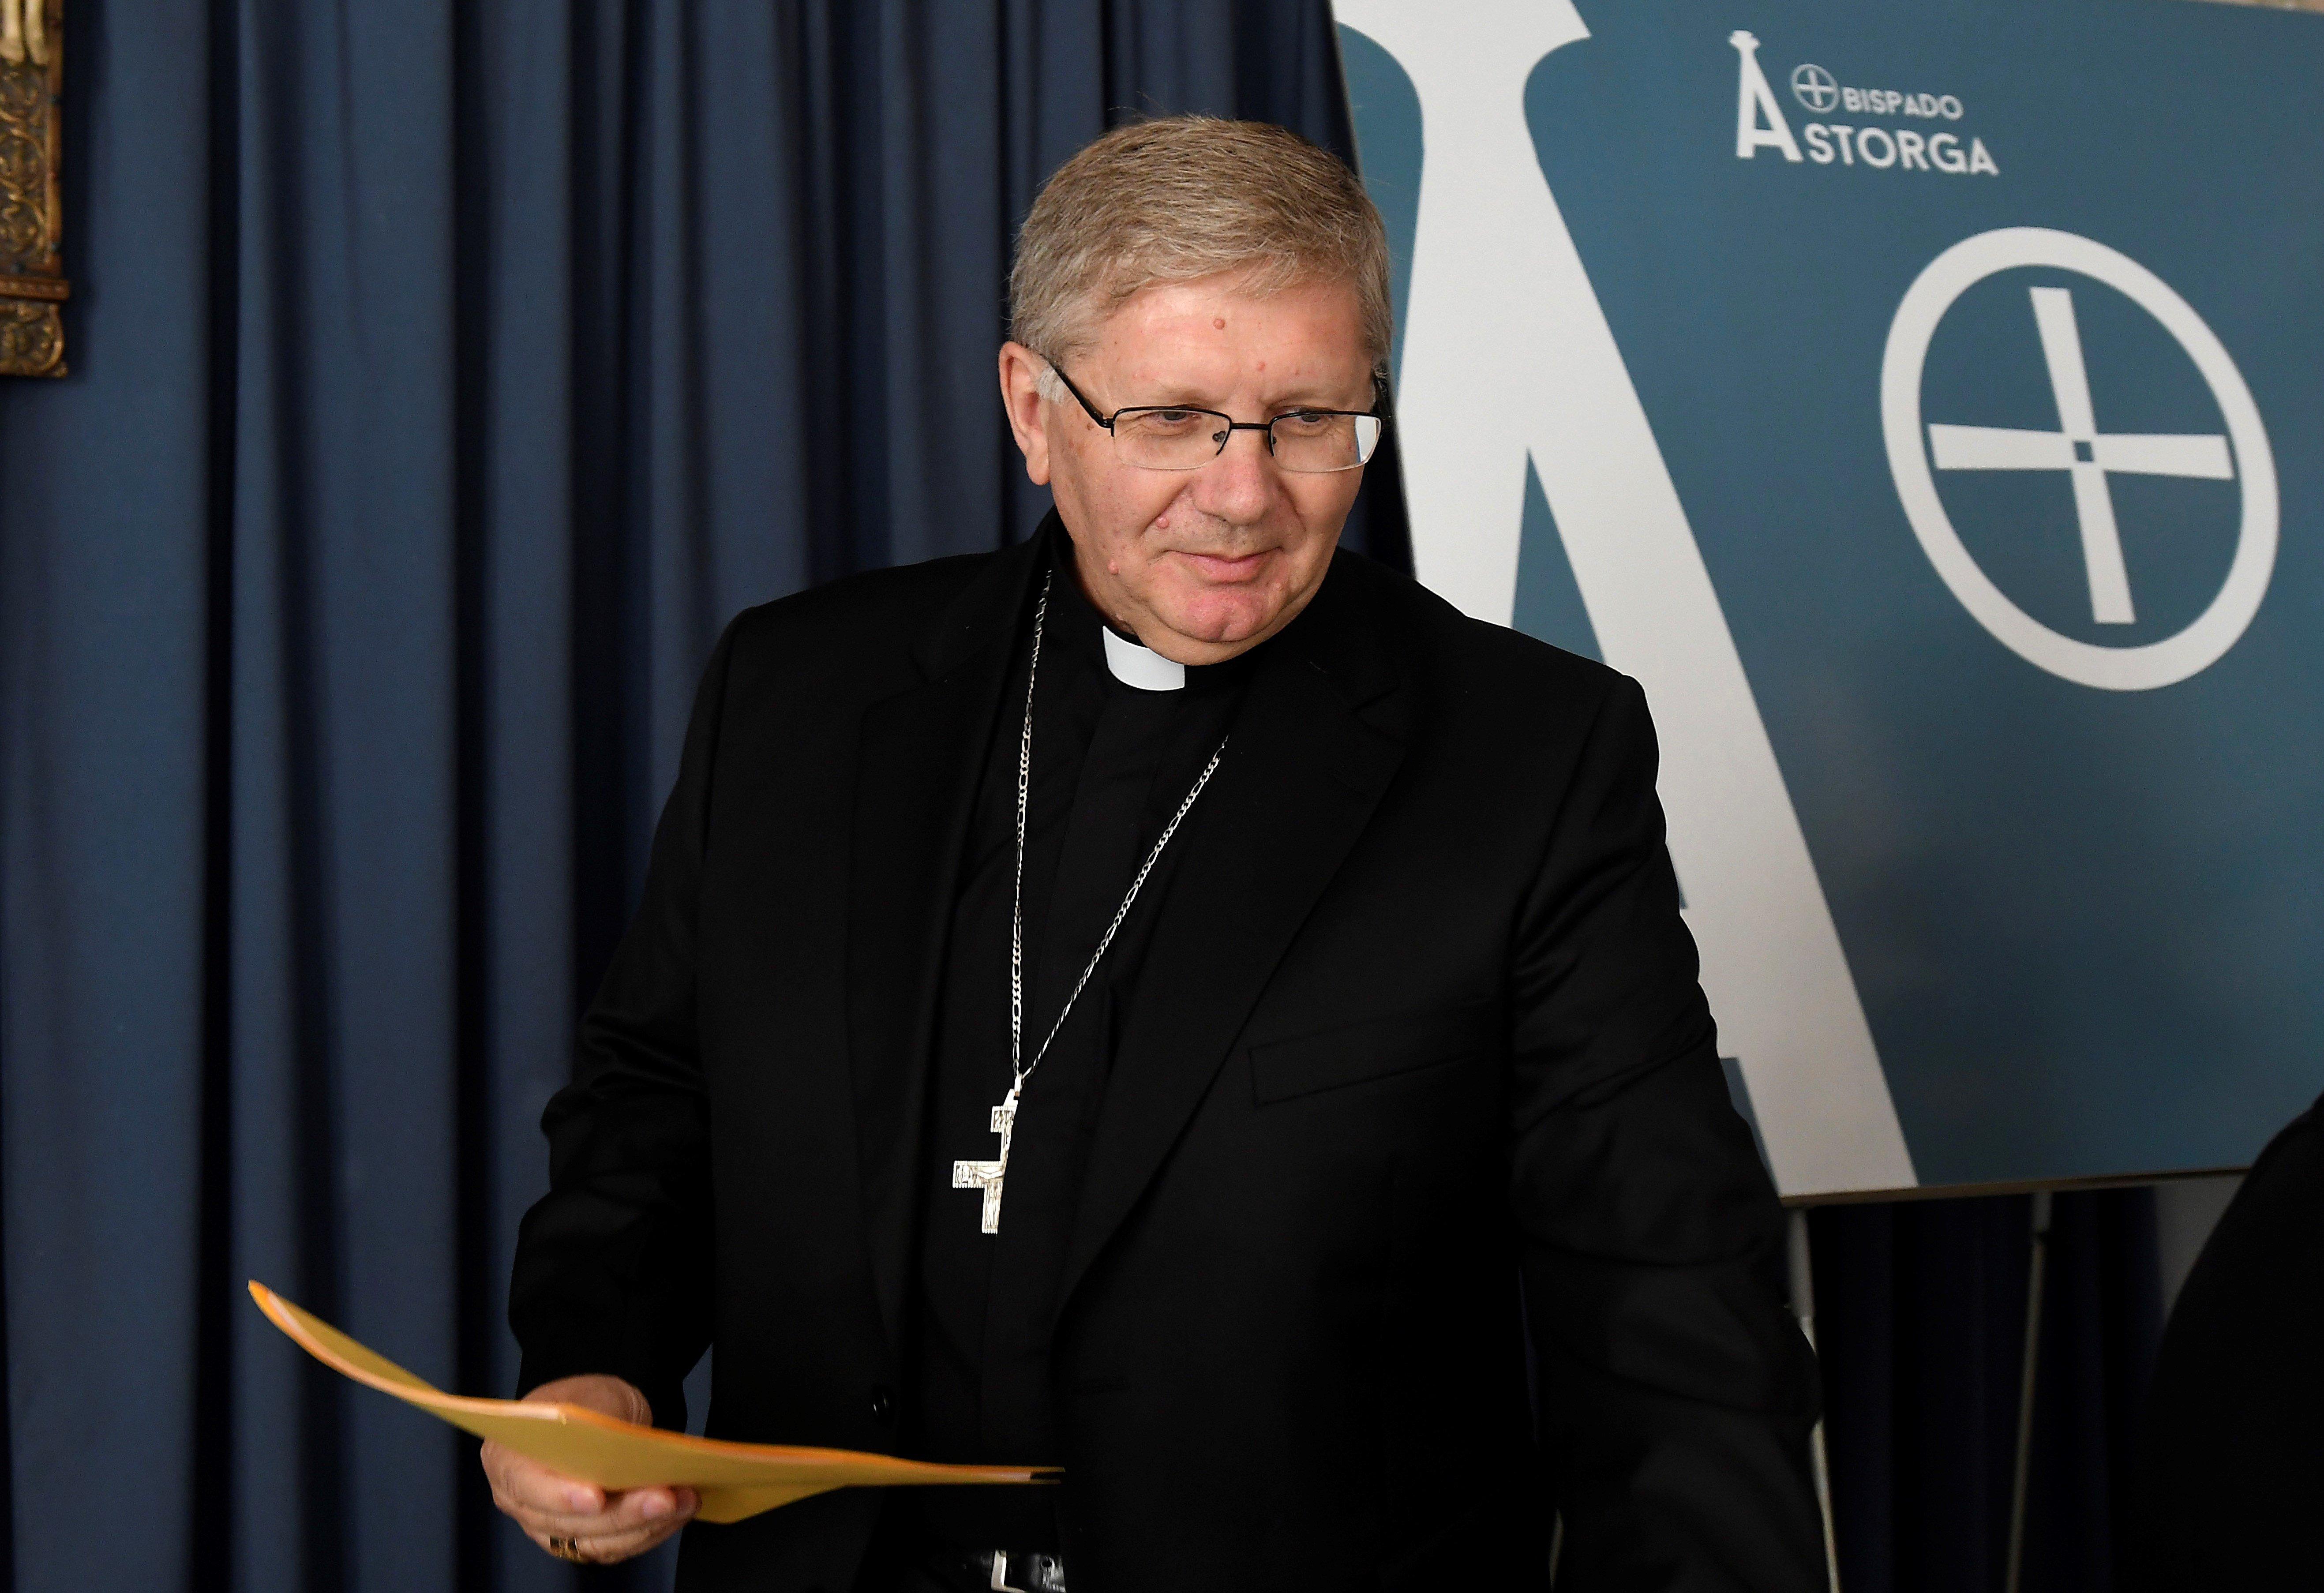 bisbe Astorga Juan Antonio Menendez Fernandez EFE